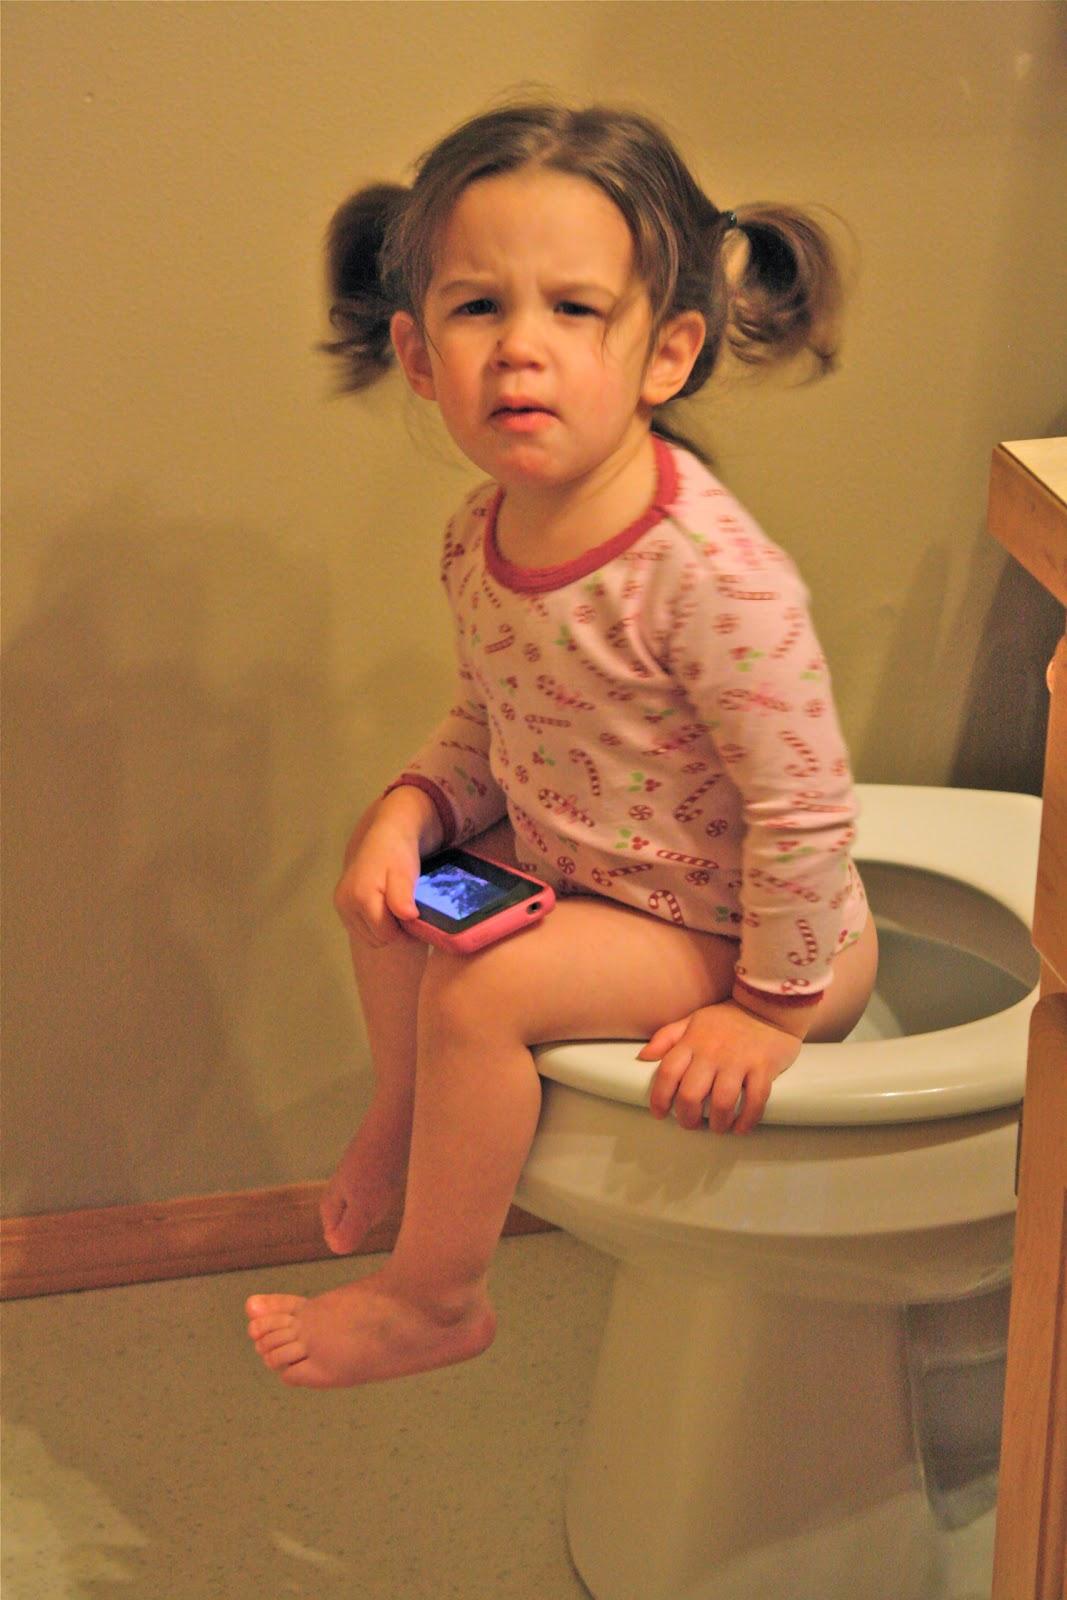 Little Girl Potty Training Boys | newhairstylesformen2014.com